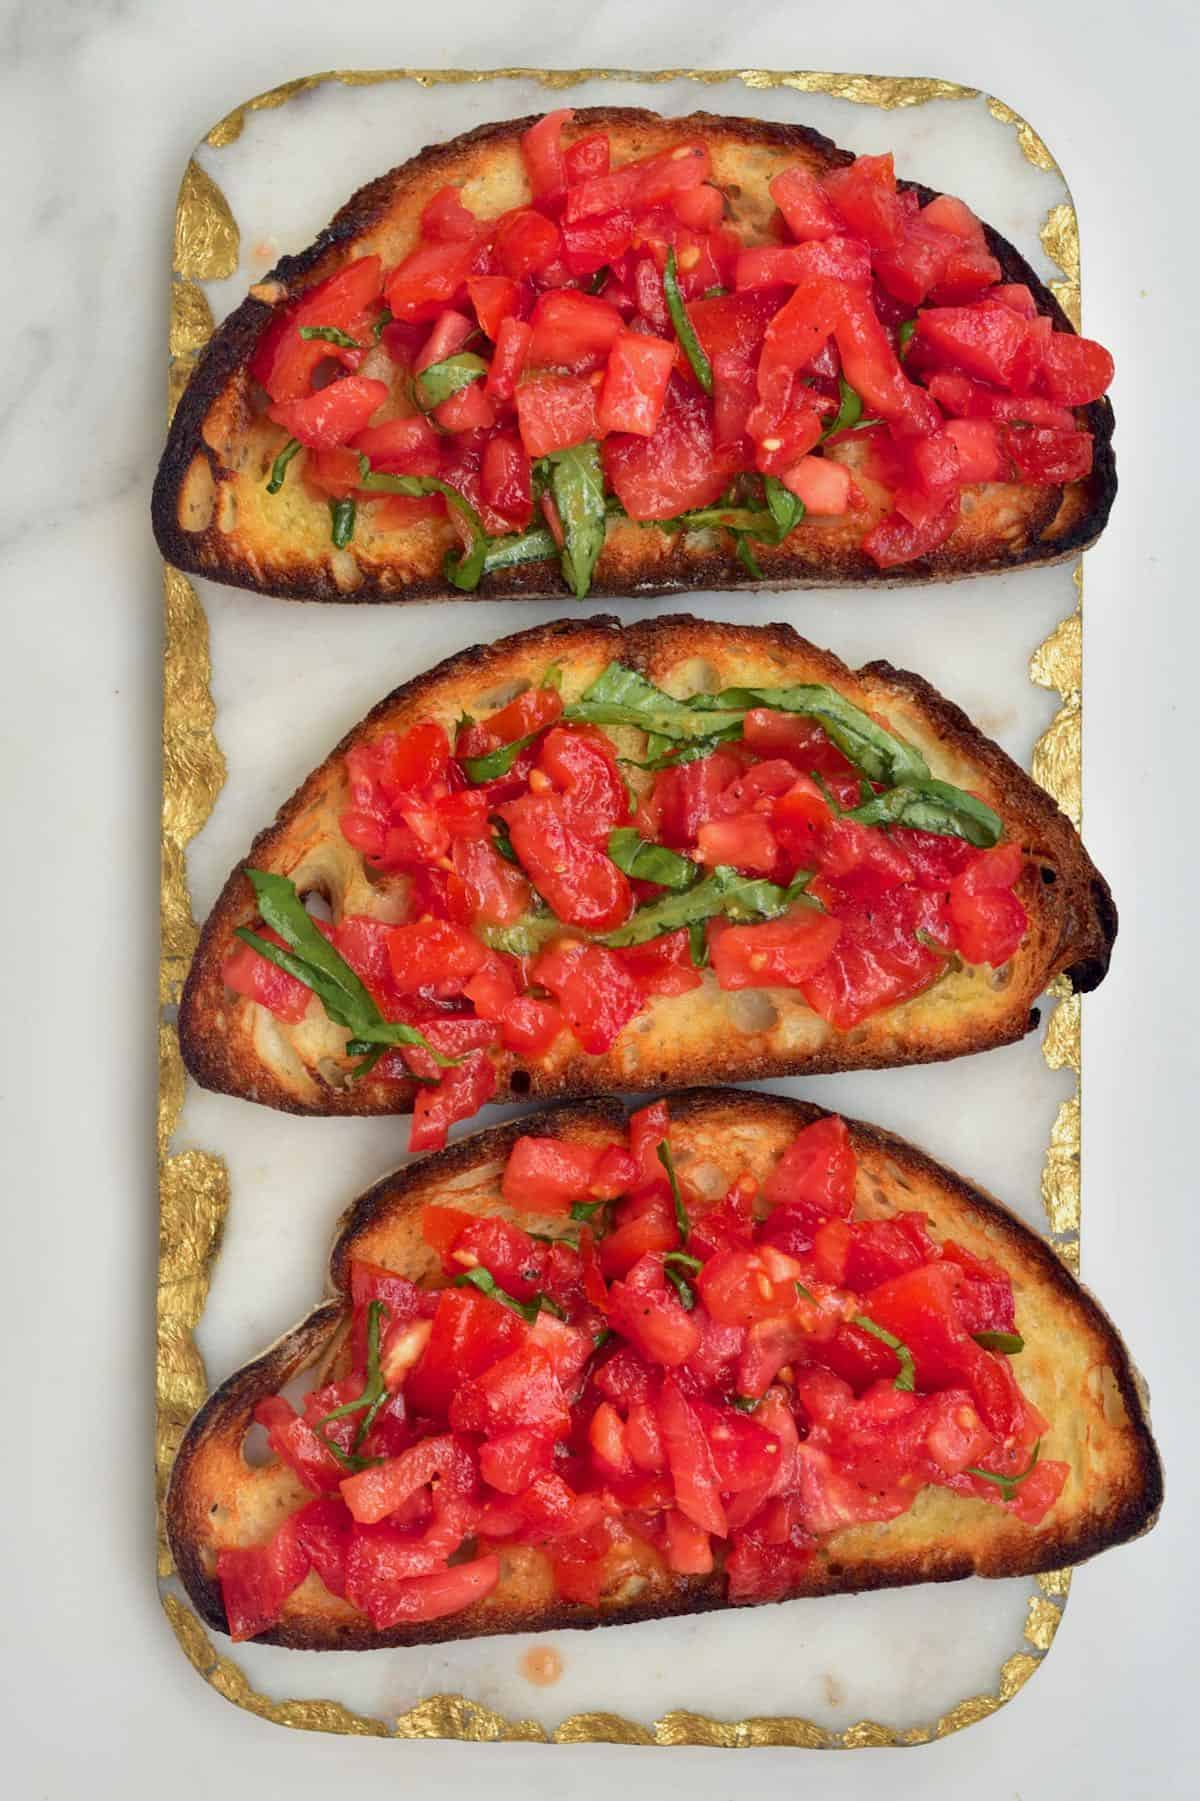 Three tomato bruschetta